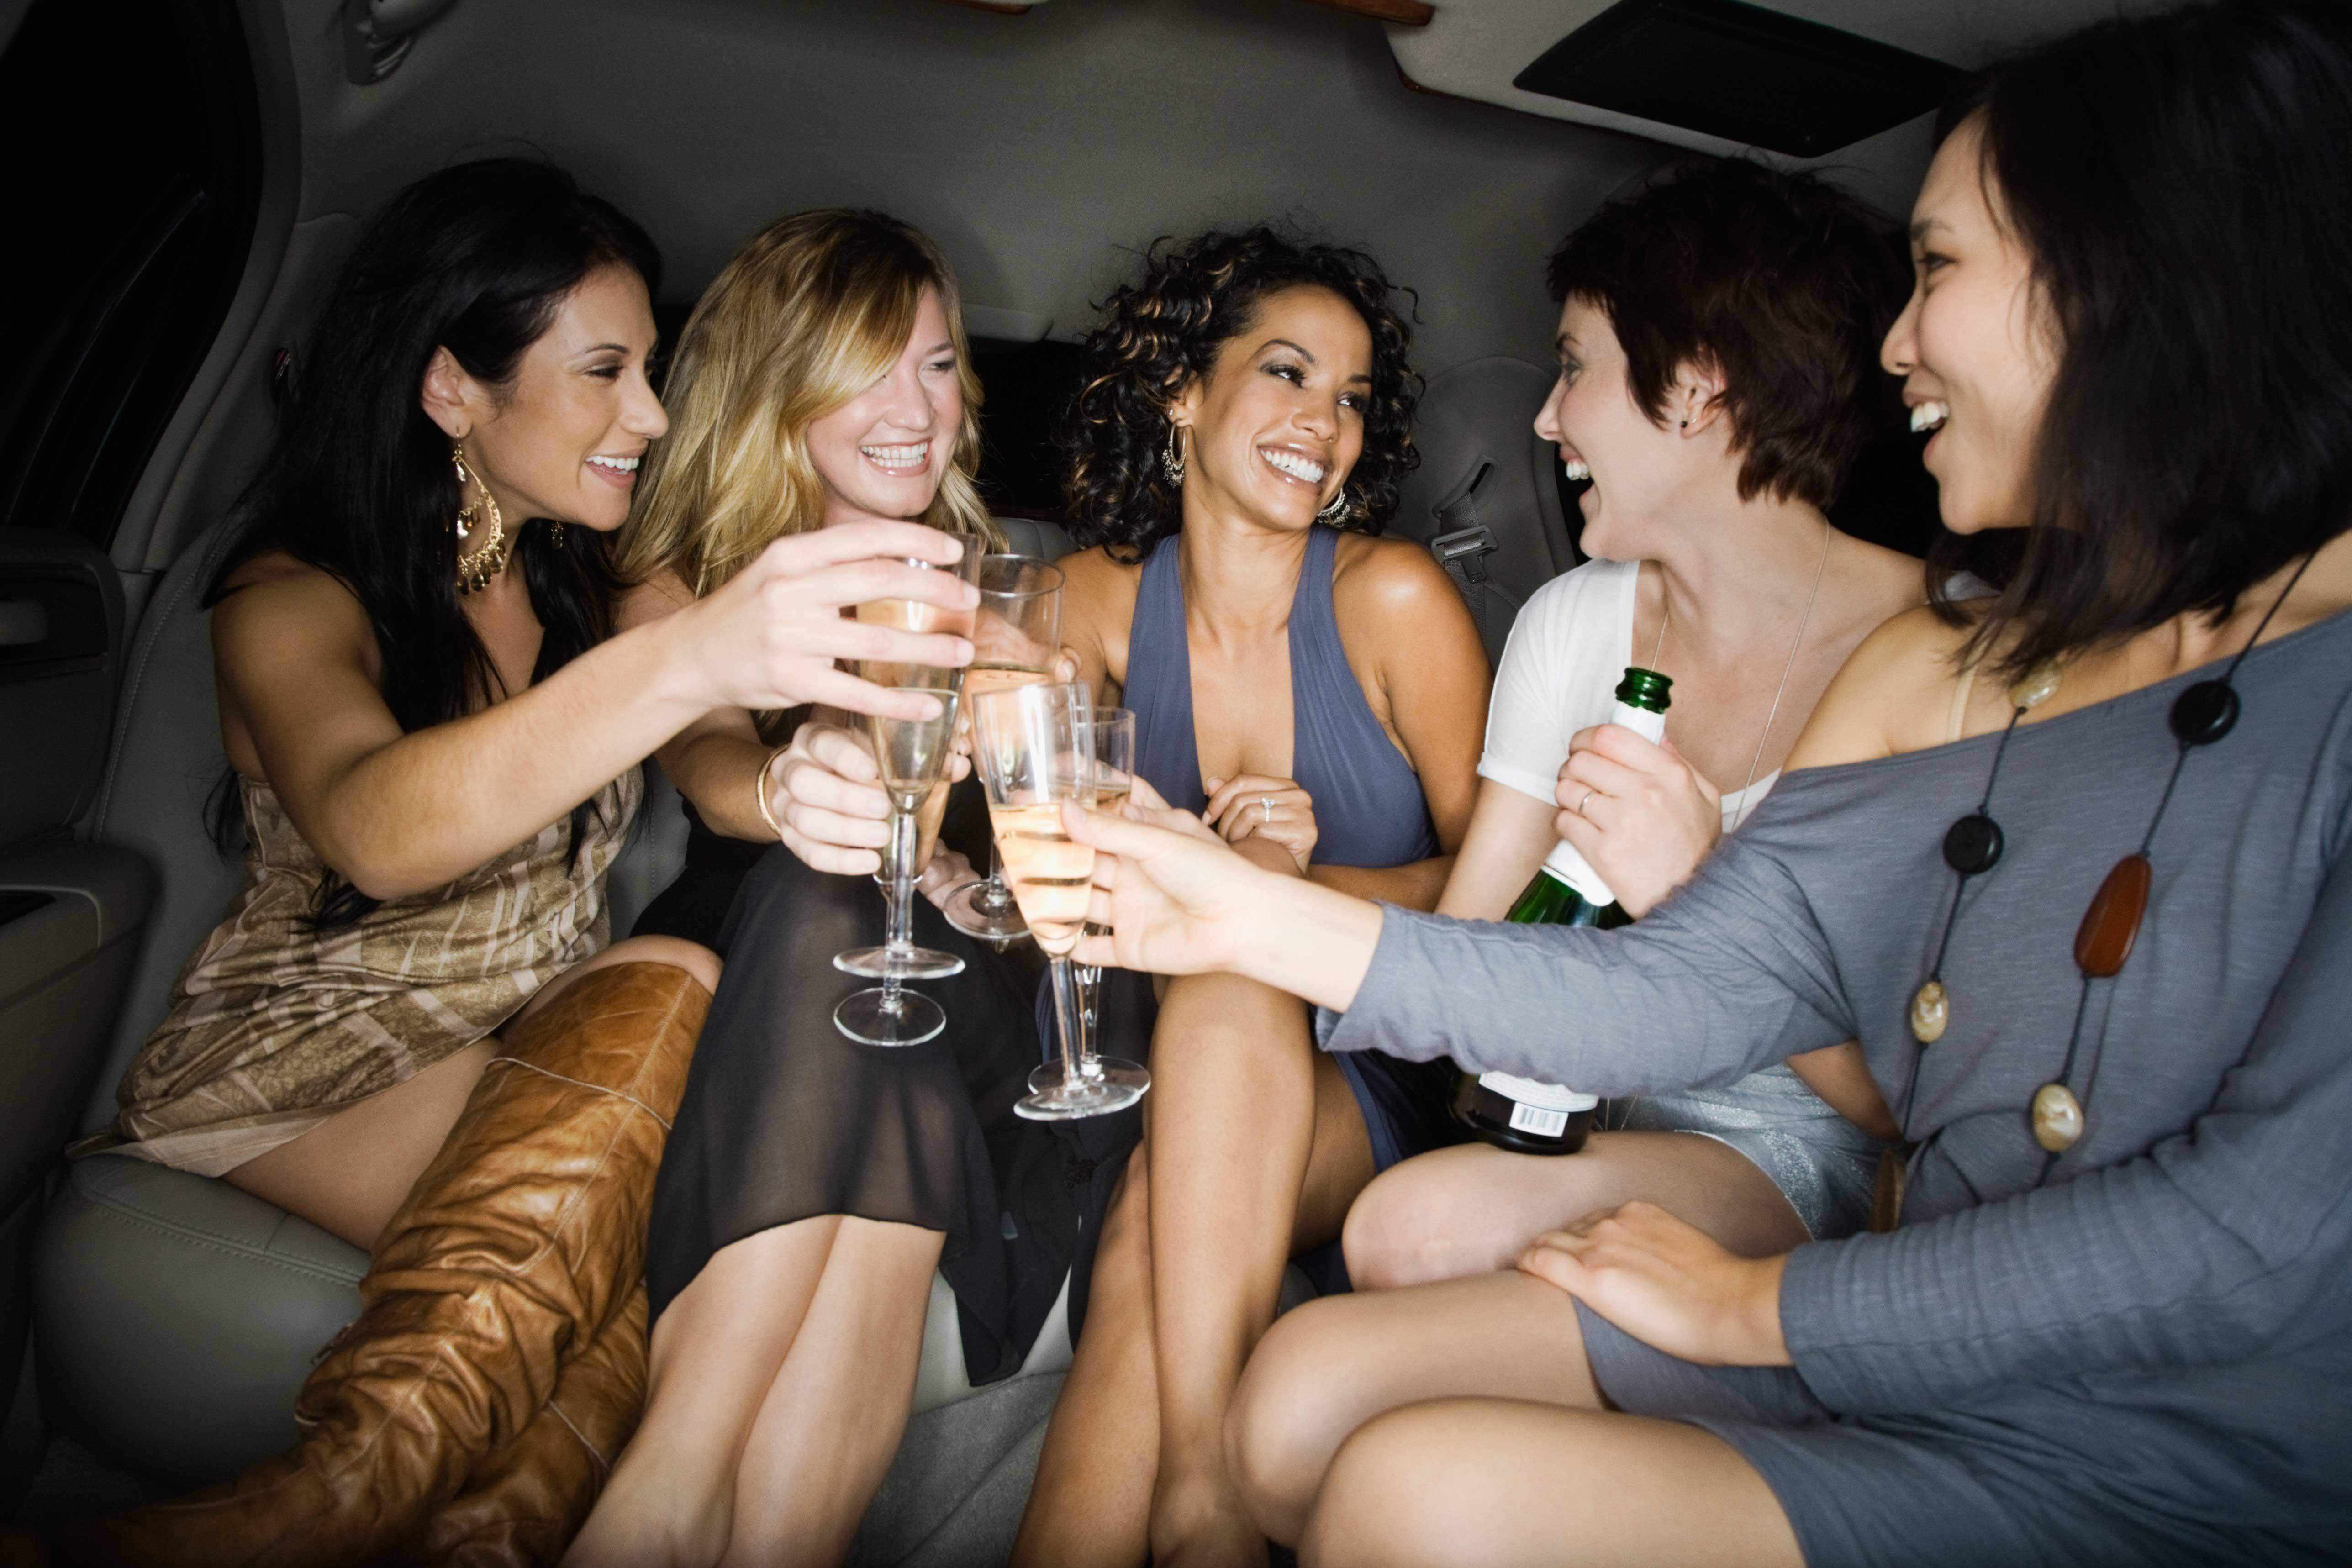 Sexy bachelorette party tumblr